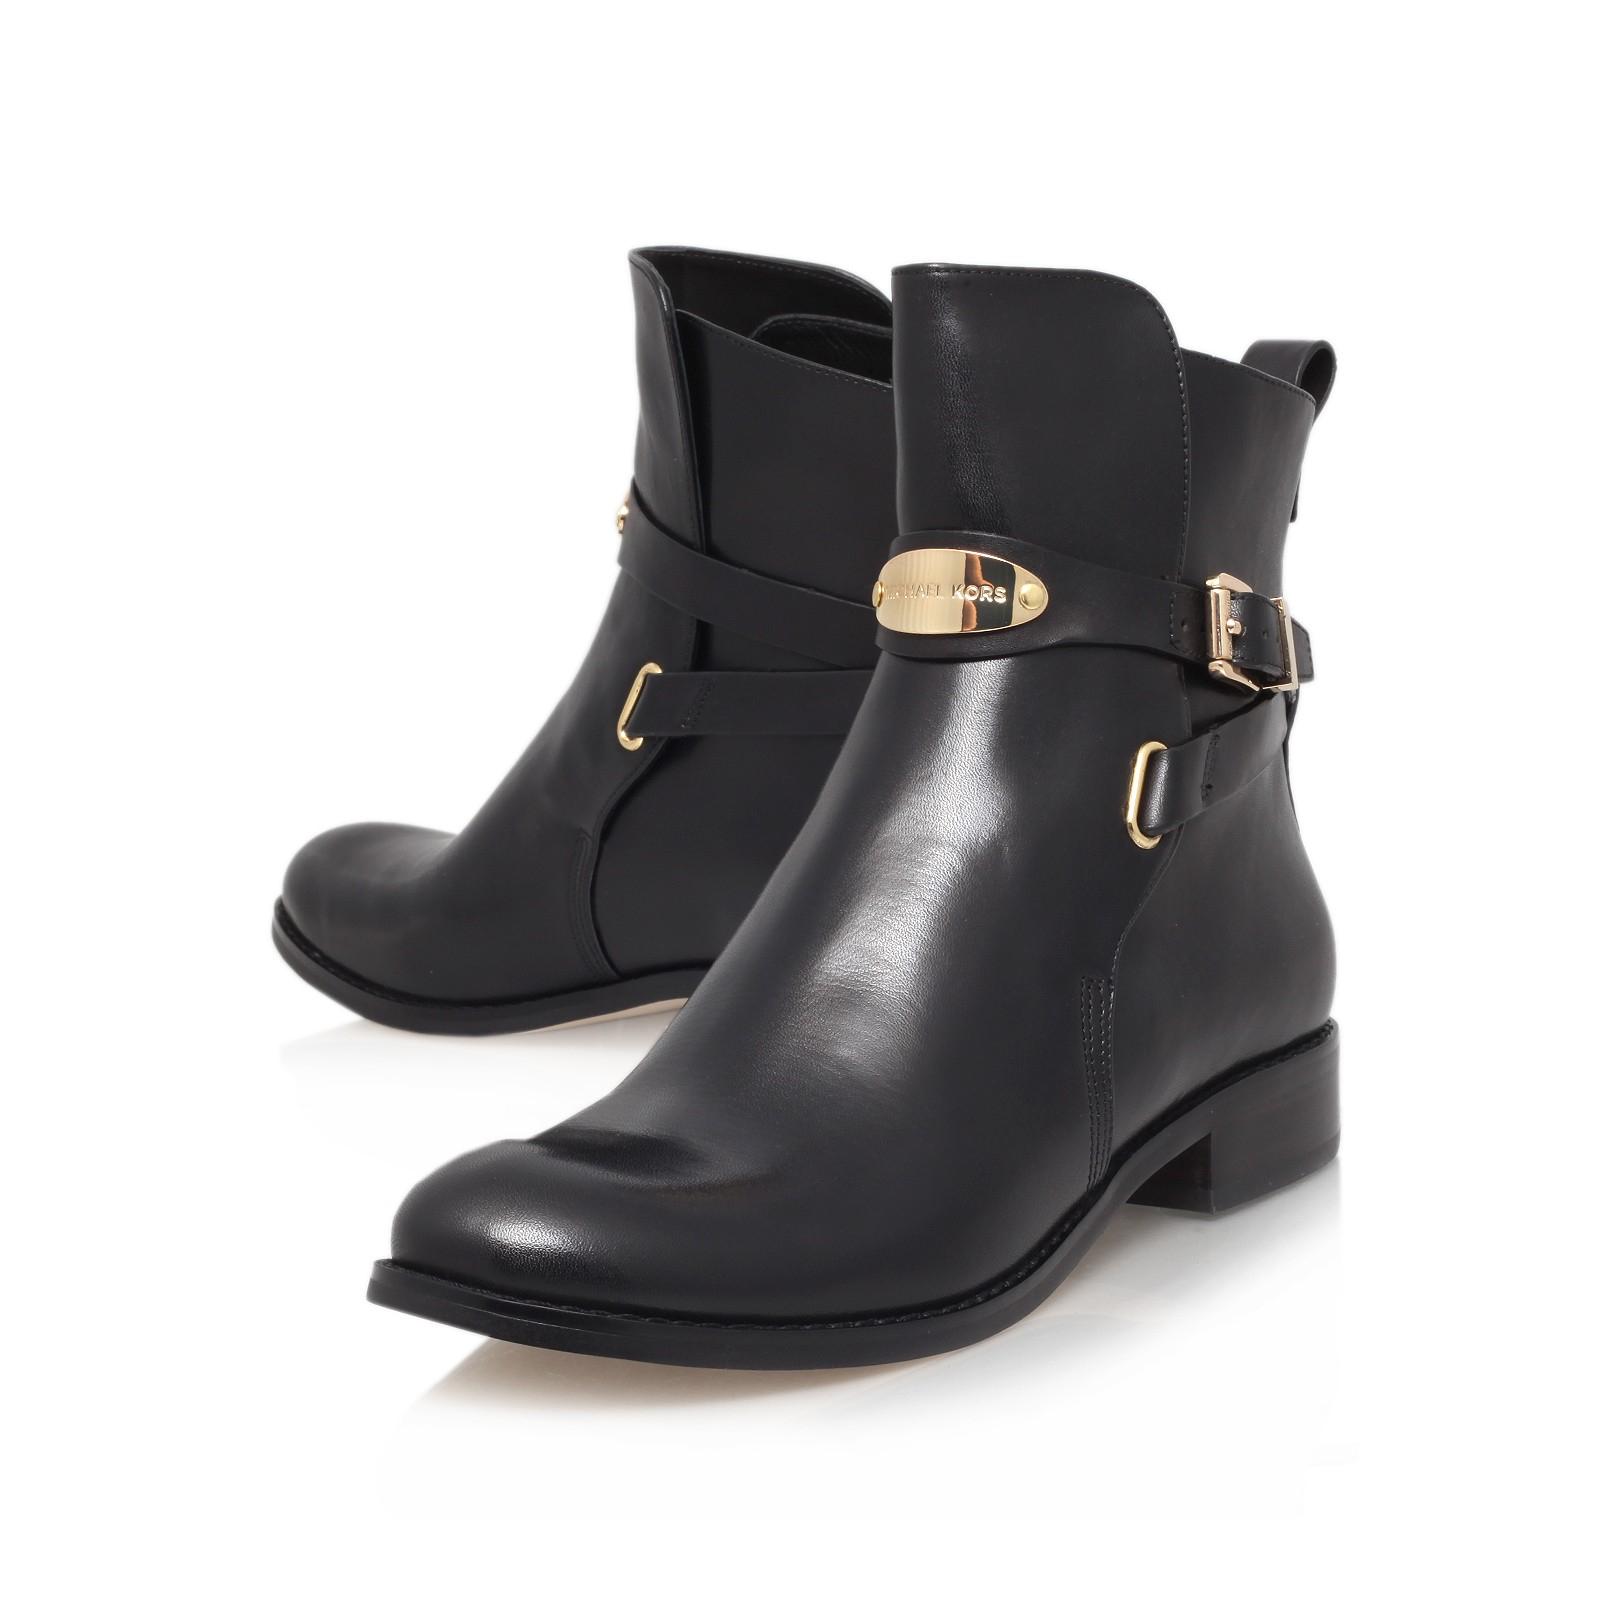 michael michael kors arley ankle boot in black lyst. Black Bedroom Furniture Sets. Home Design Ideas